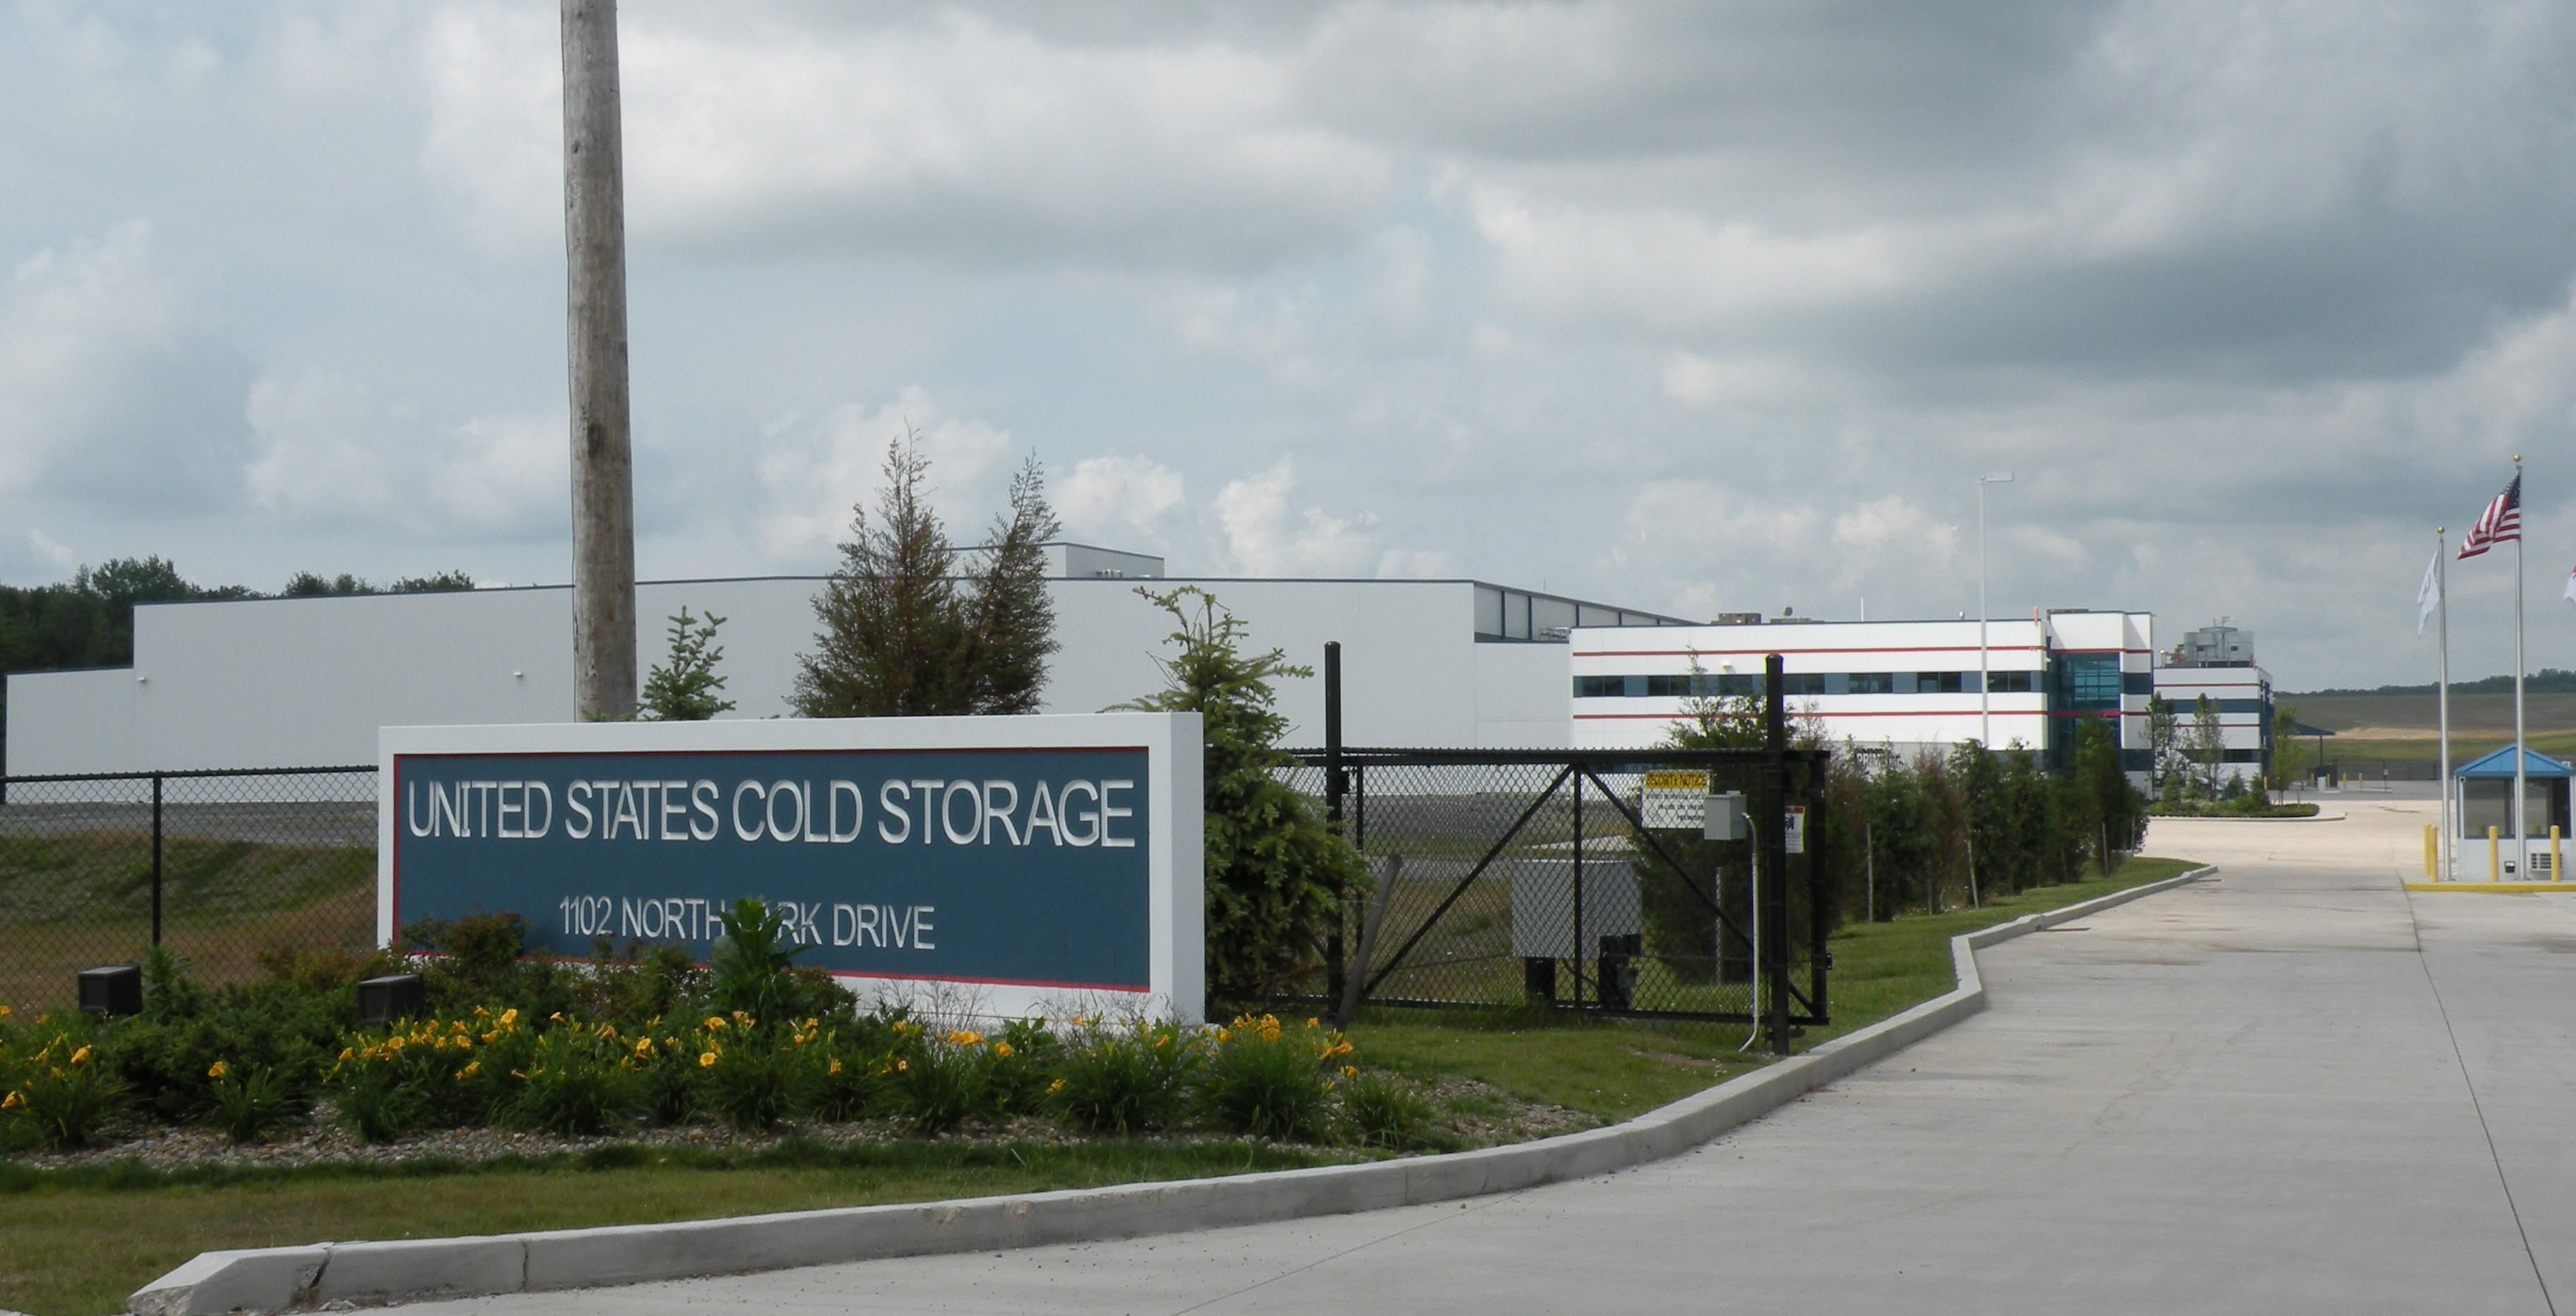 united states cold storage